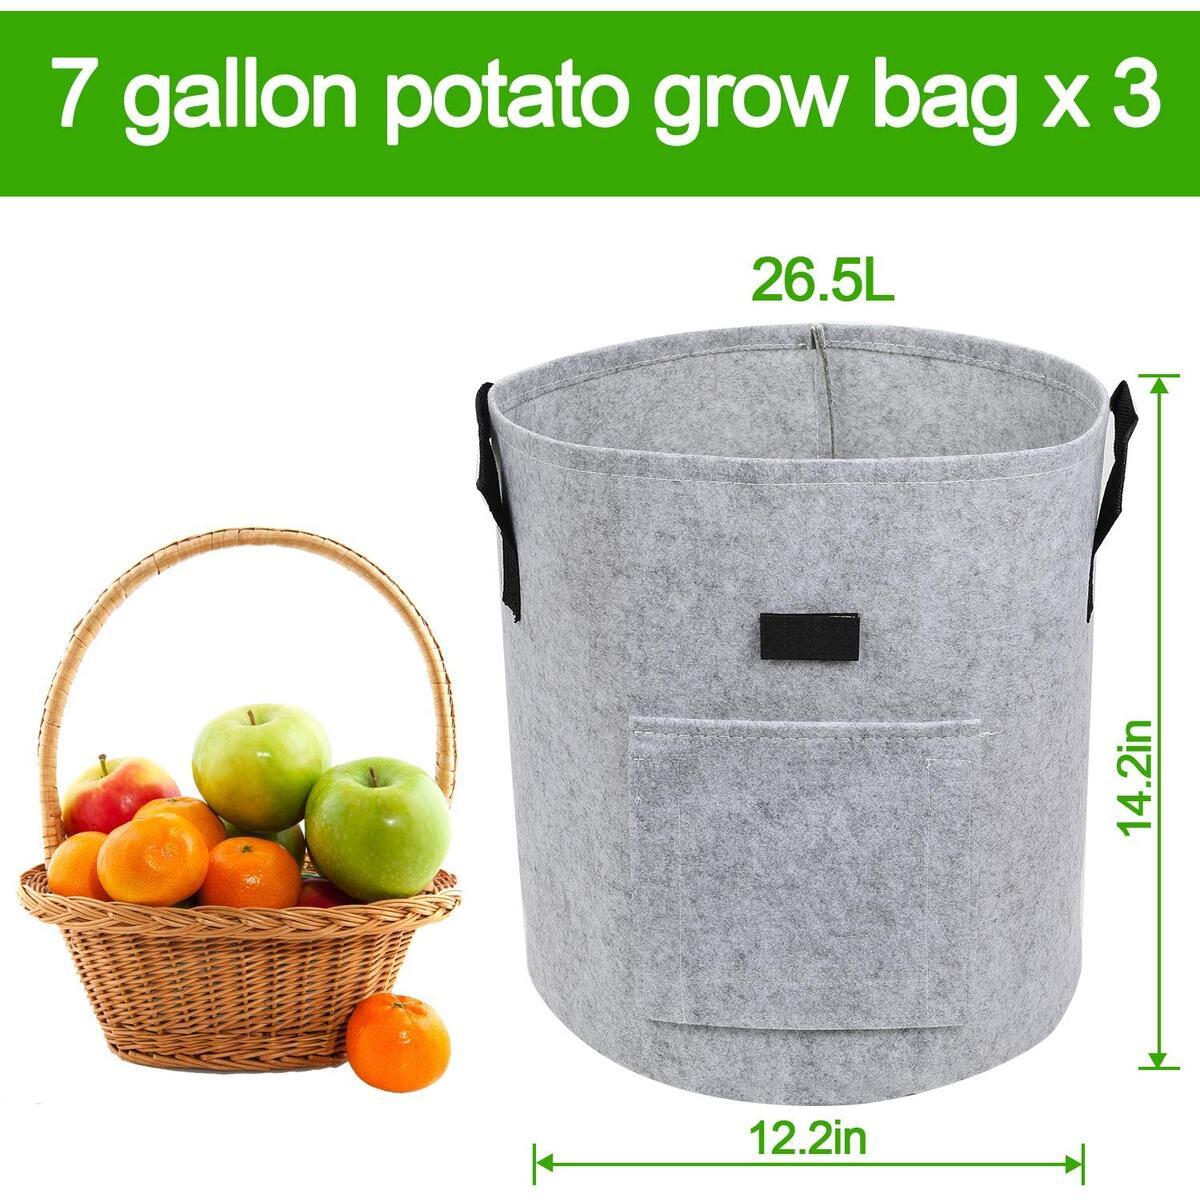 Grow Bags 3-Pack 7 Gallon Smart Potato Bags Velcro Window Vegetable Bags with Handles, Premium Breathable Nonwoven Fabric Pots/Plant Container for Potato, Carrot, Onion (3-Pcs Plant Labels, Gray)